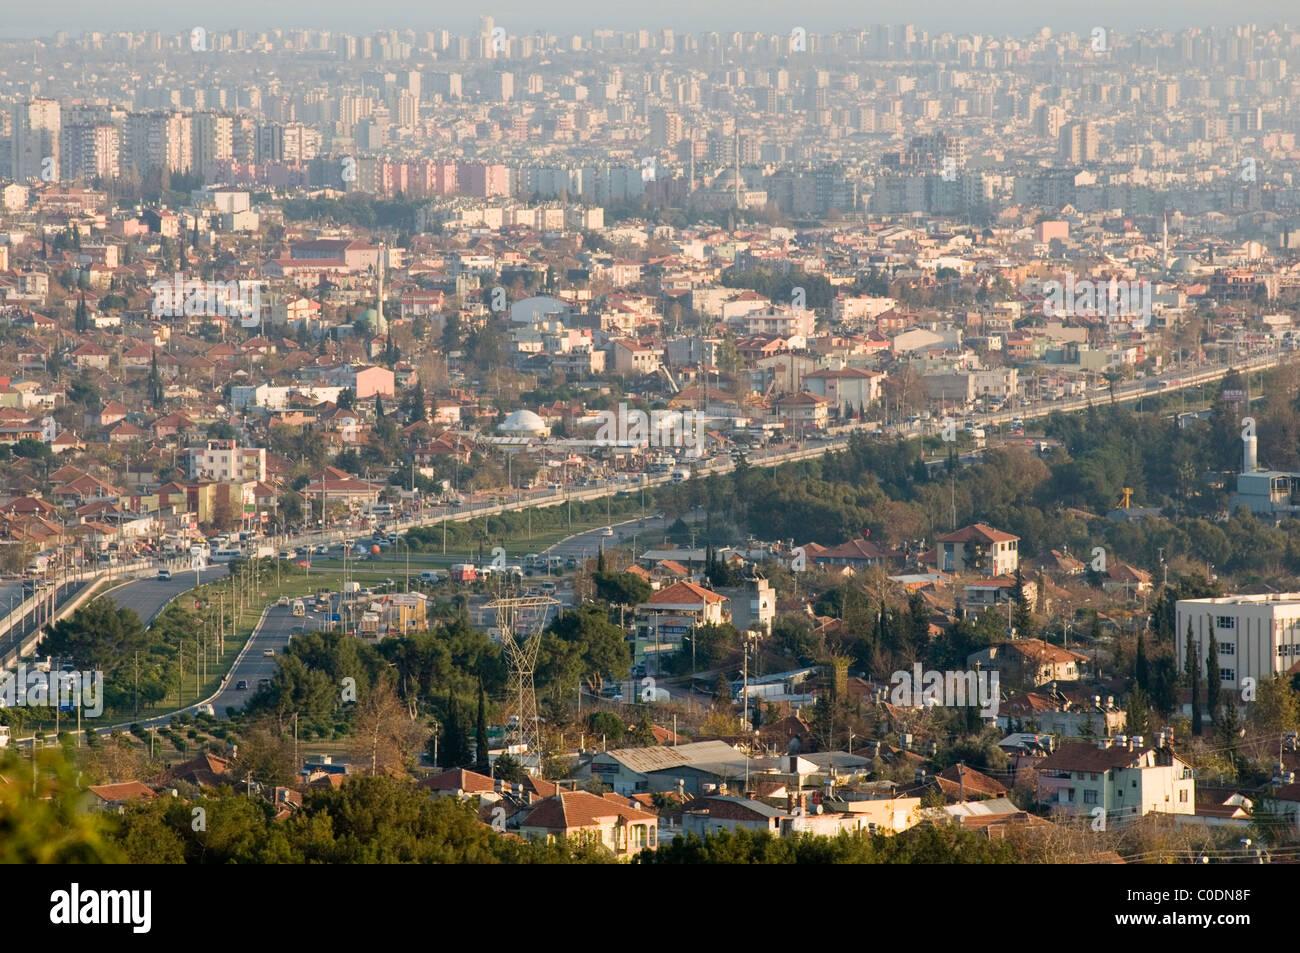 antalya turkey turkish city cities sprawl sprawling urban landscape high rise building conurbation conurbations - Stock Image